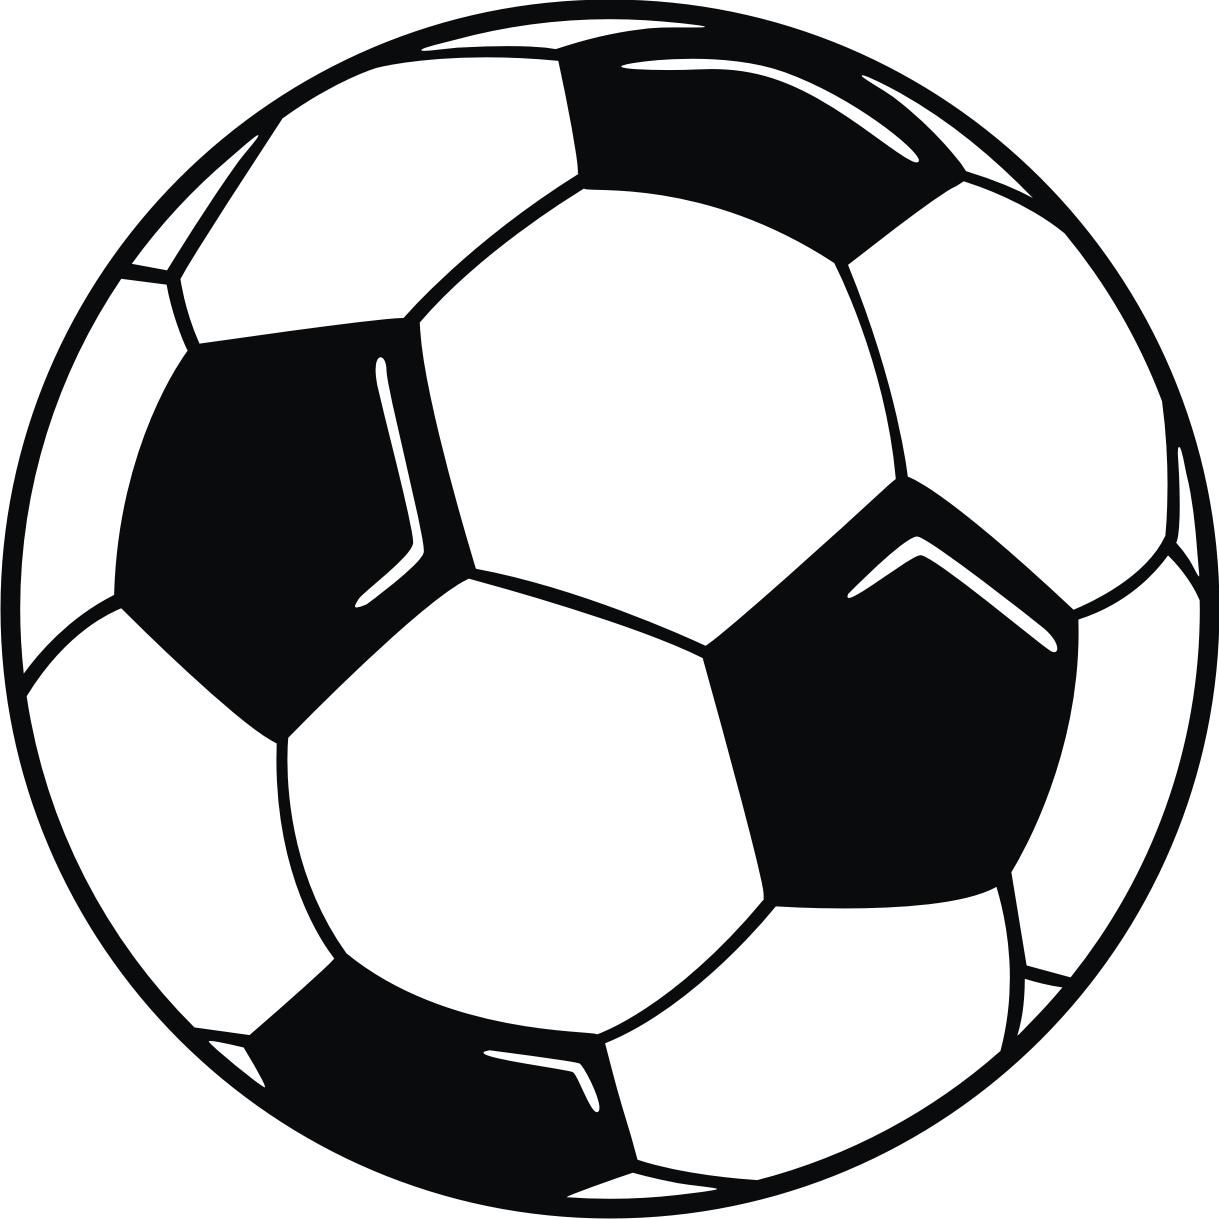 Sports Balls Clipart Borders   Clipart Panda - Free ...